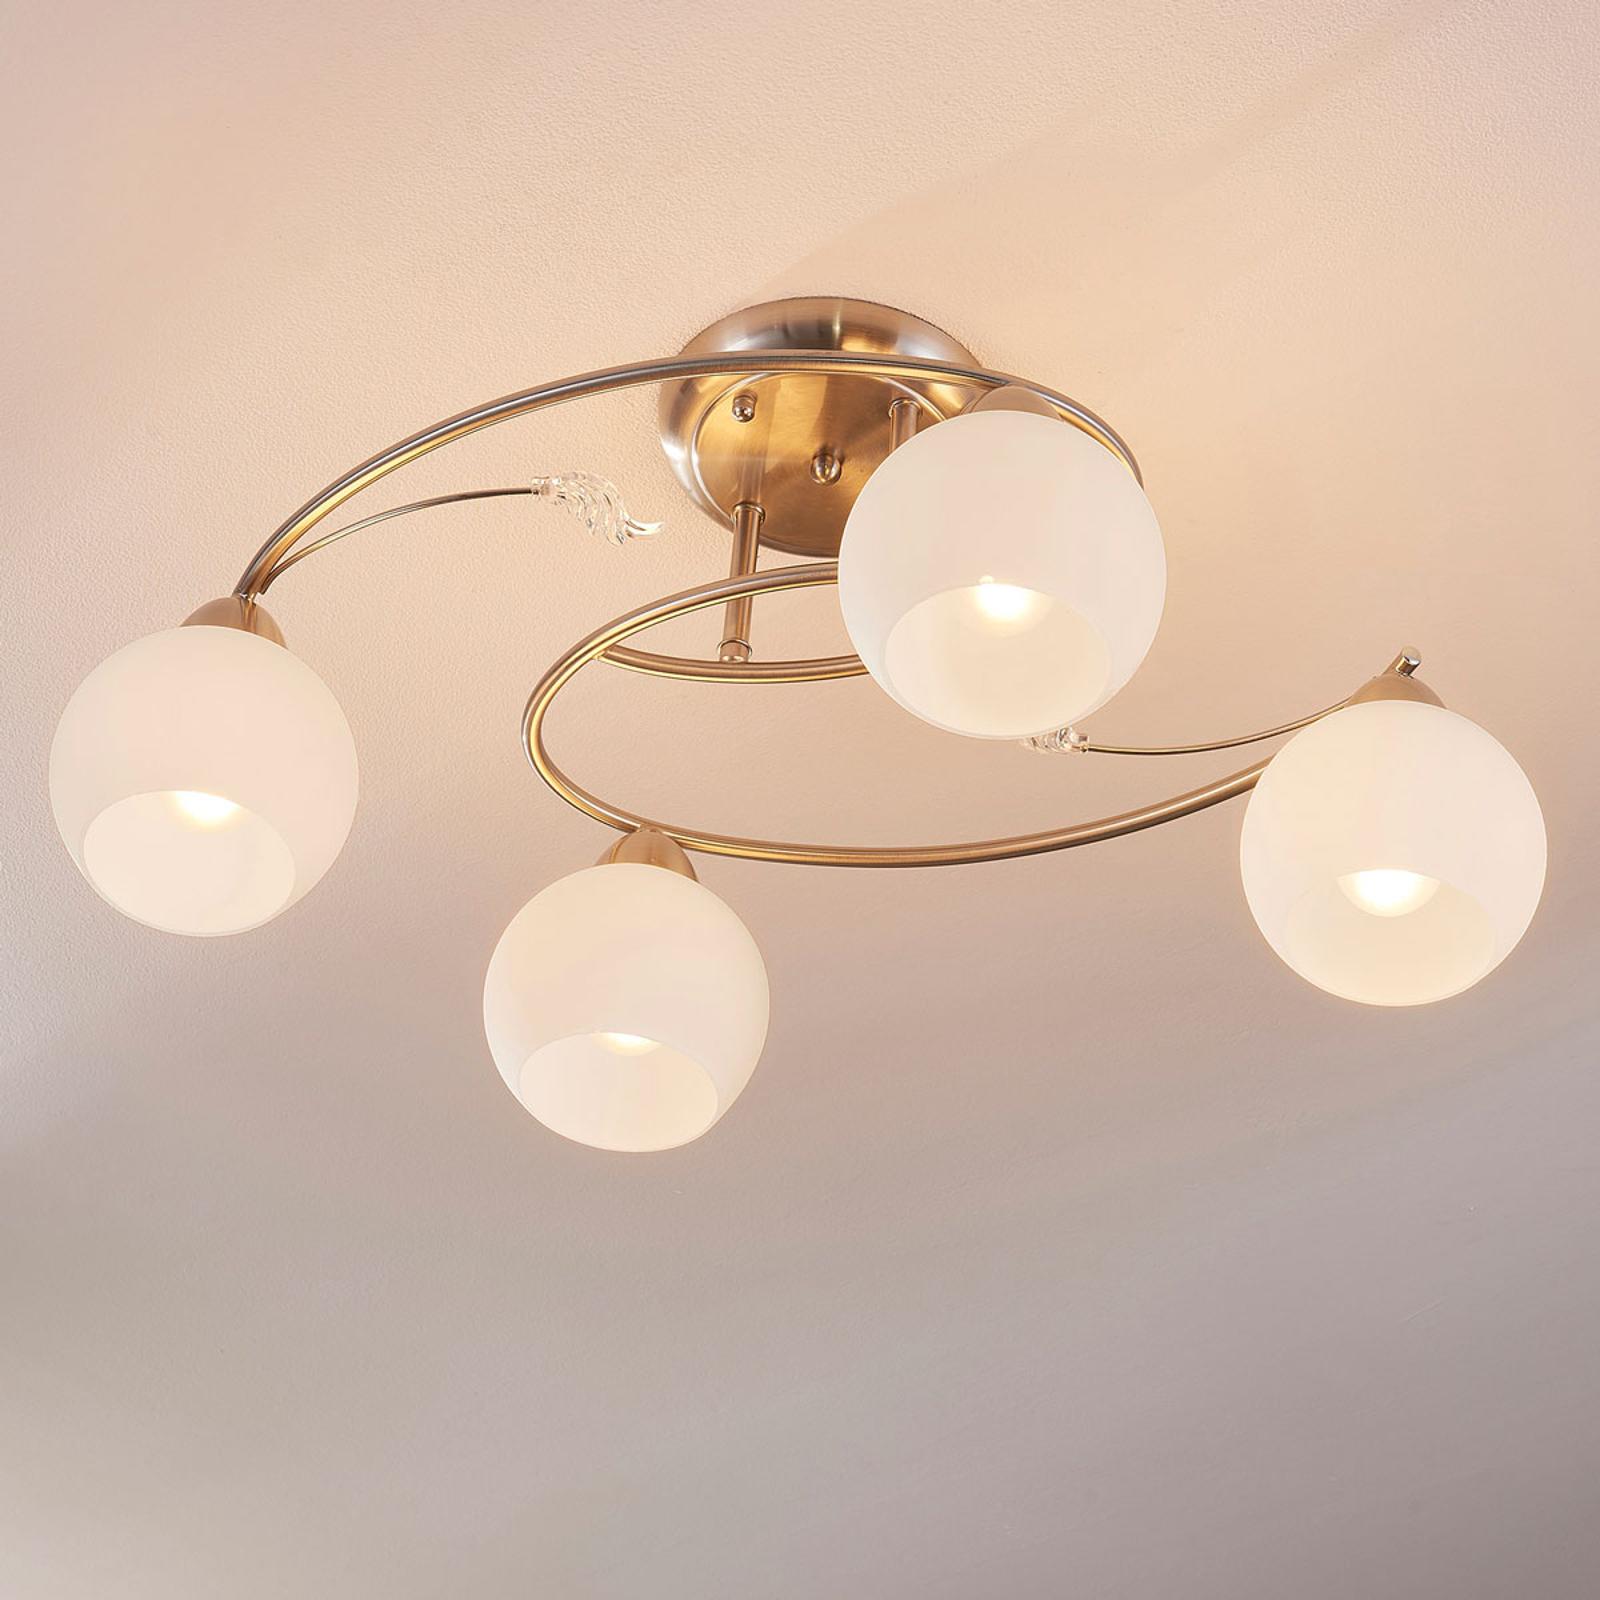 Plafonnier à quatre lampes Svean